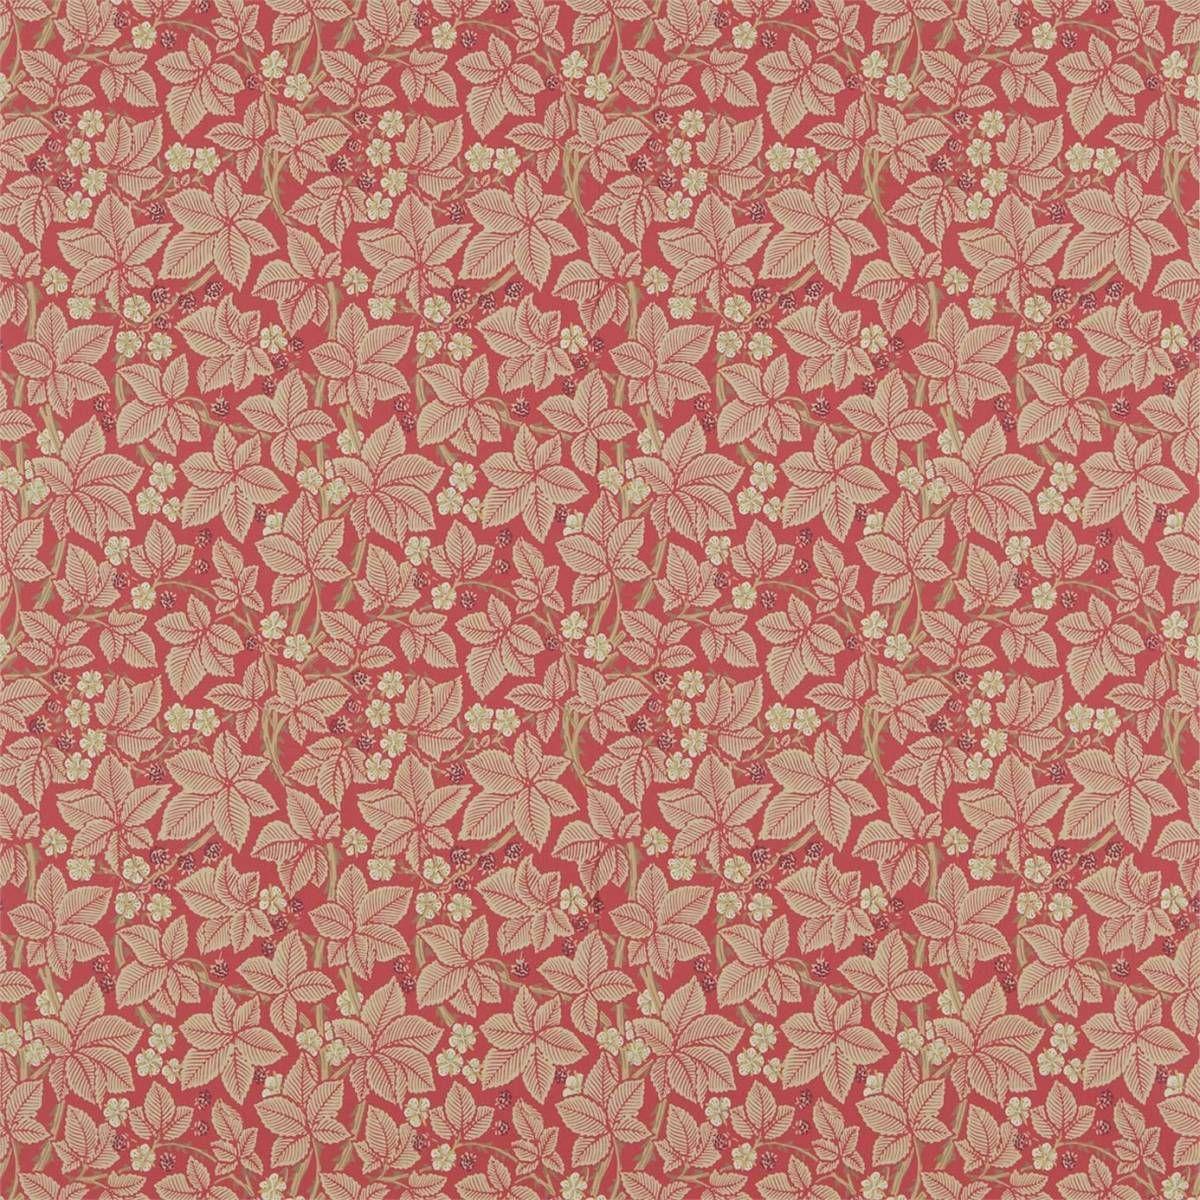 Bramble Wallpaper Red (214697) William Morris & Co